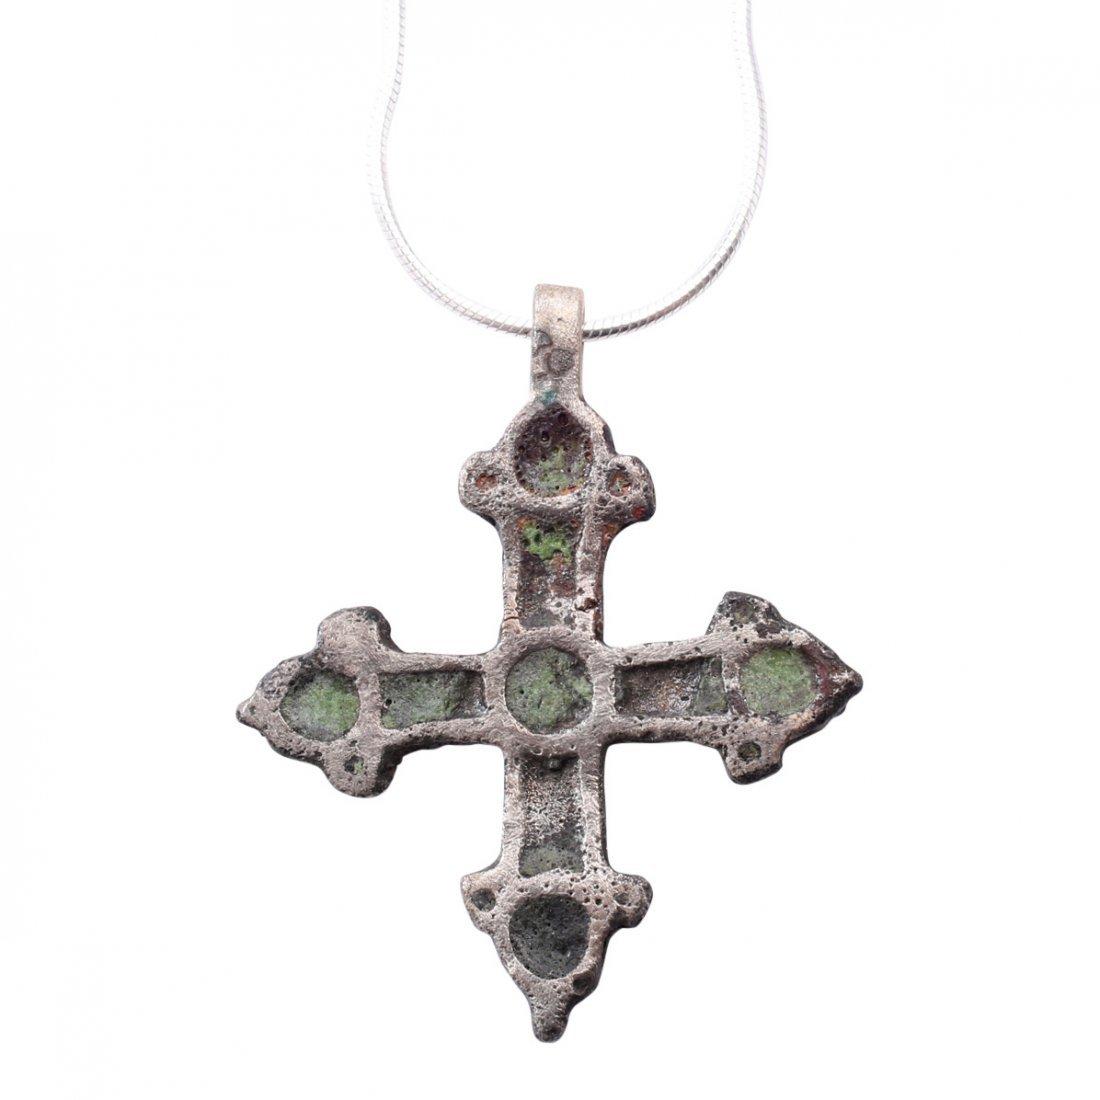 Spanish Cross 15-17th C